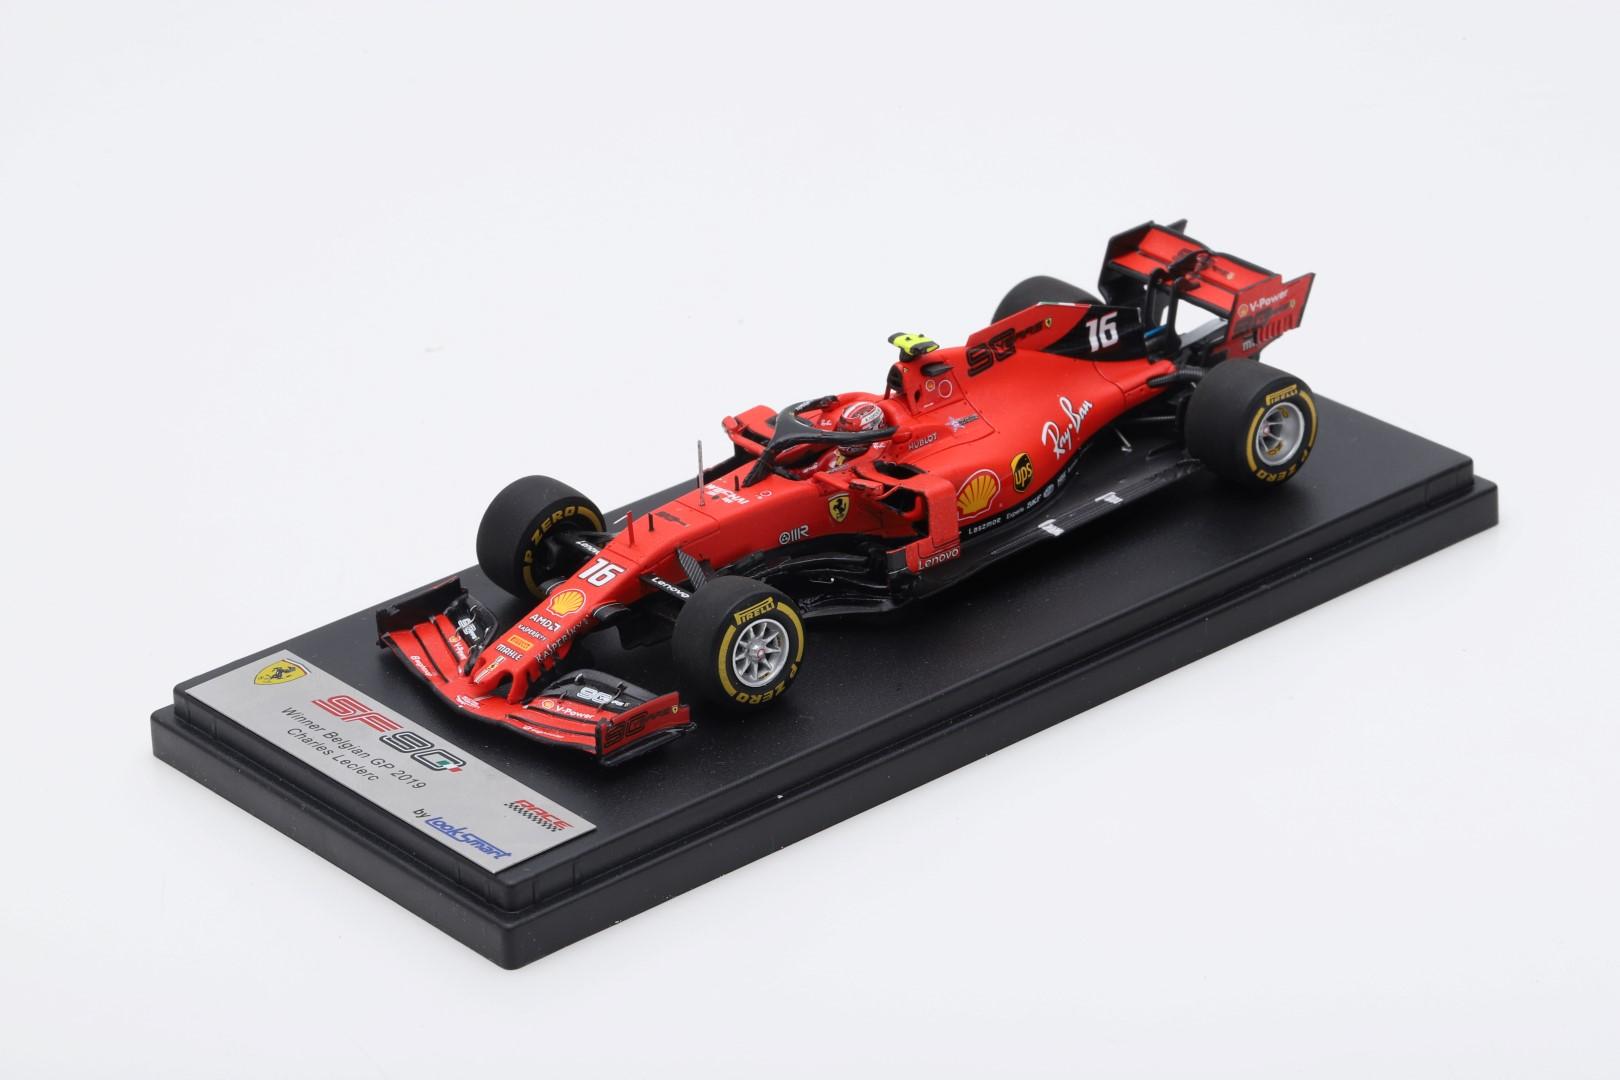 Ferrari Sf90 Belgian Gp 2019 Leclerc 1 43 Looksmart Models